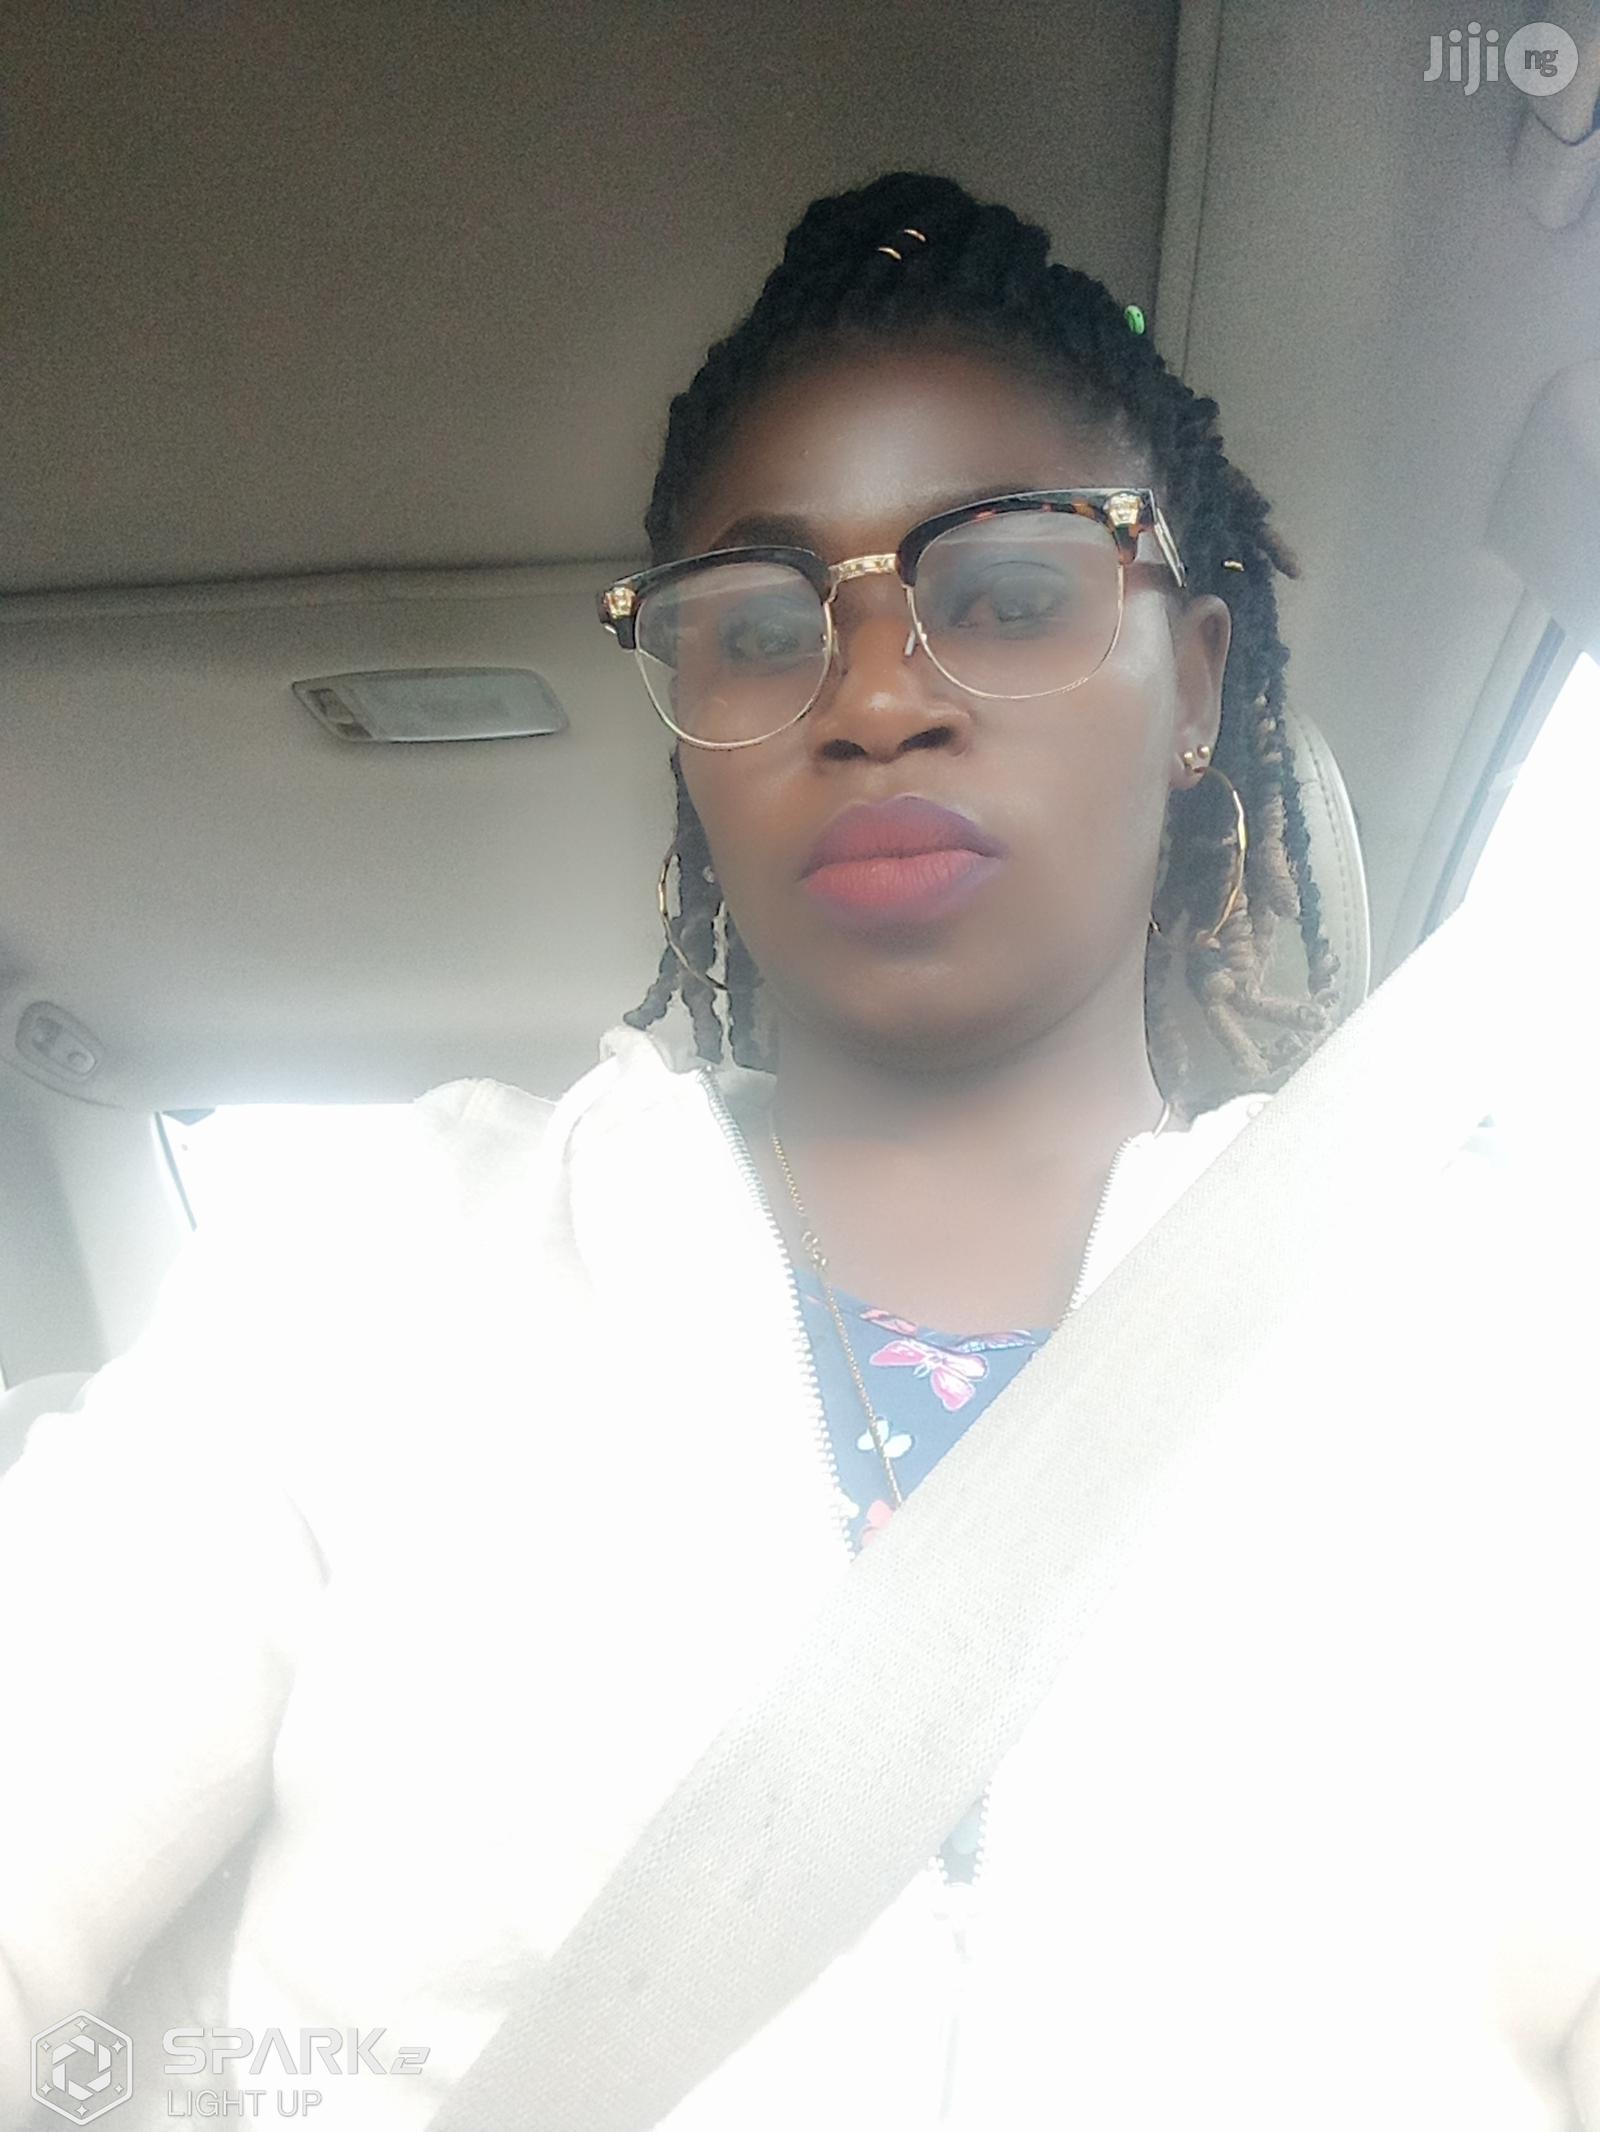 Sales Agent - Car Department | Sales & Telemarketing CVs for sale in Enugu, Enugu State, Nigeria